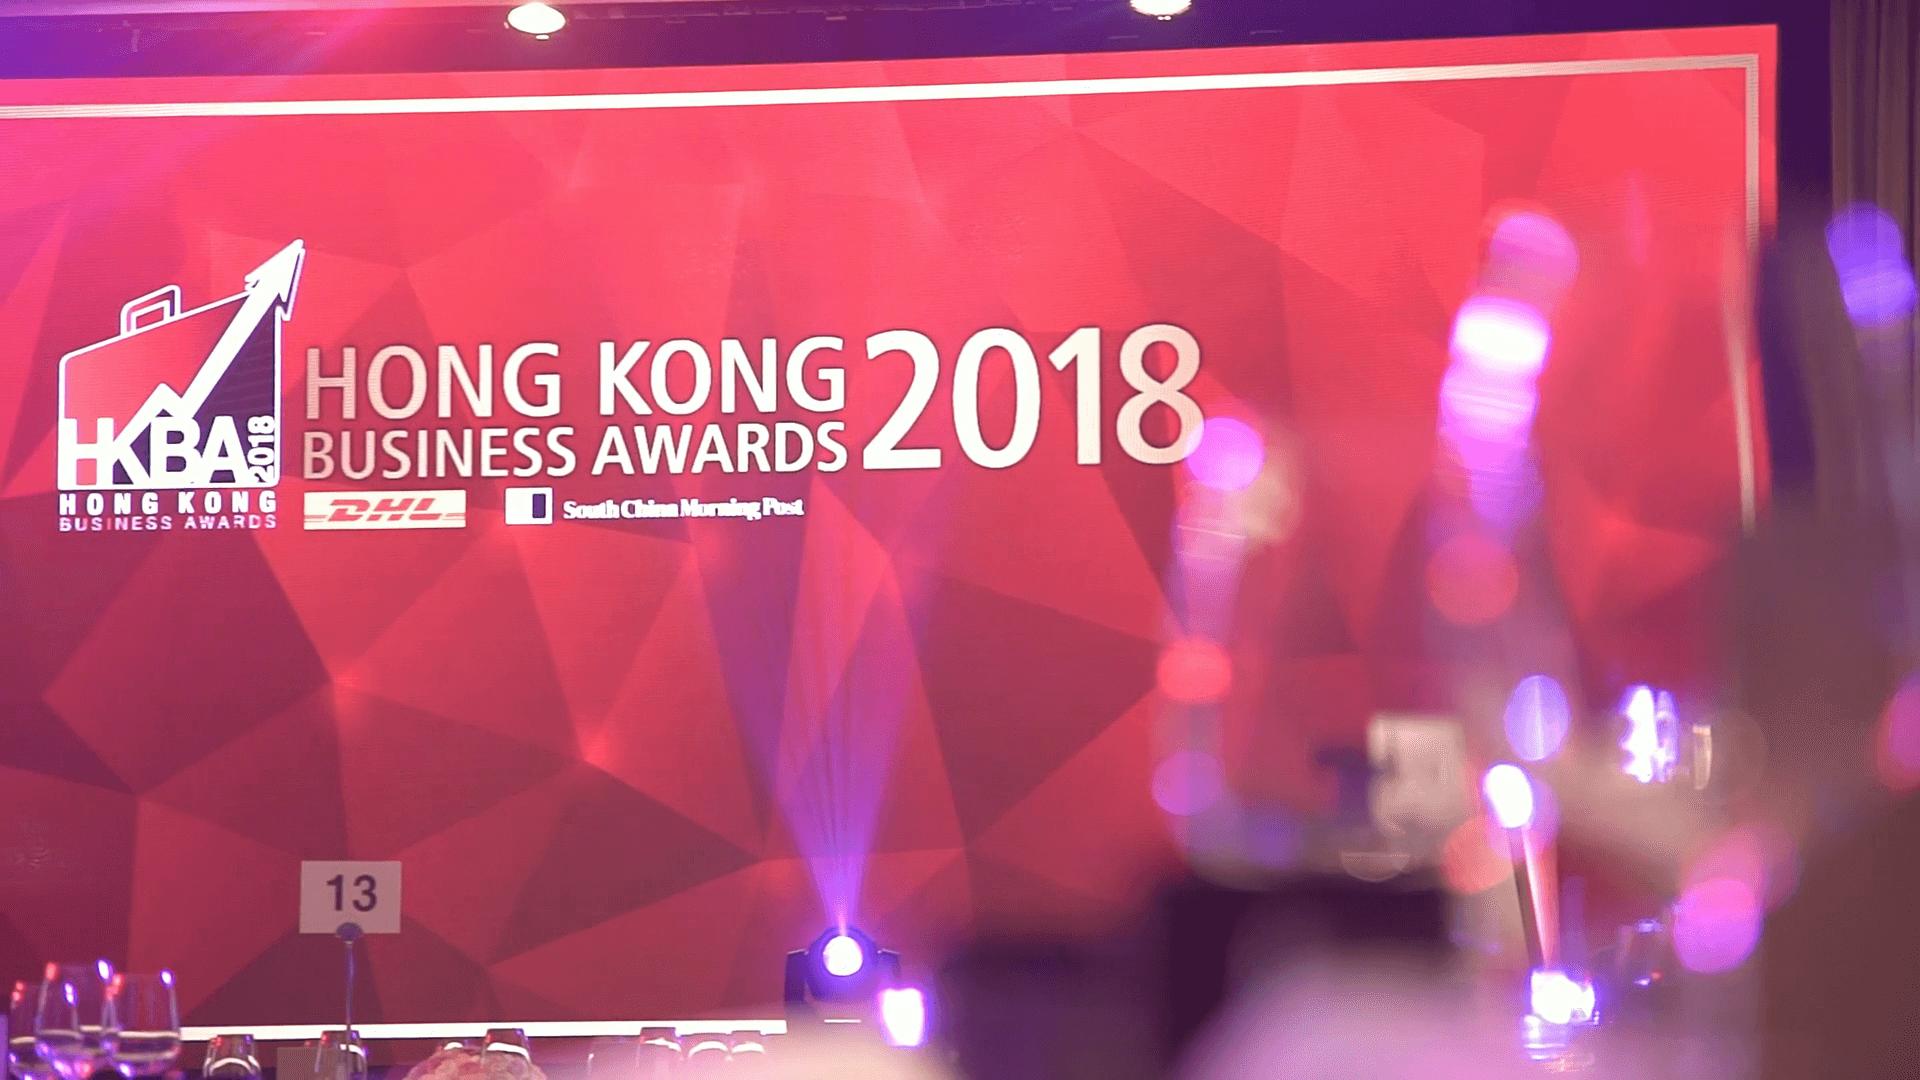 Hong Kong Business Awards